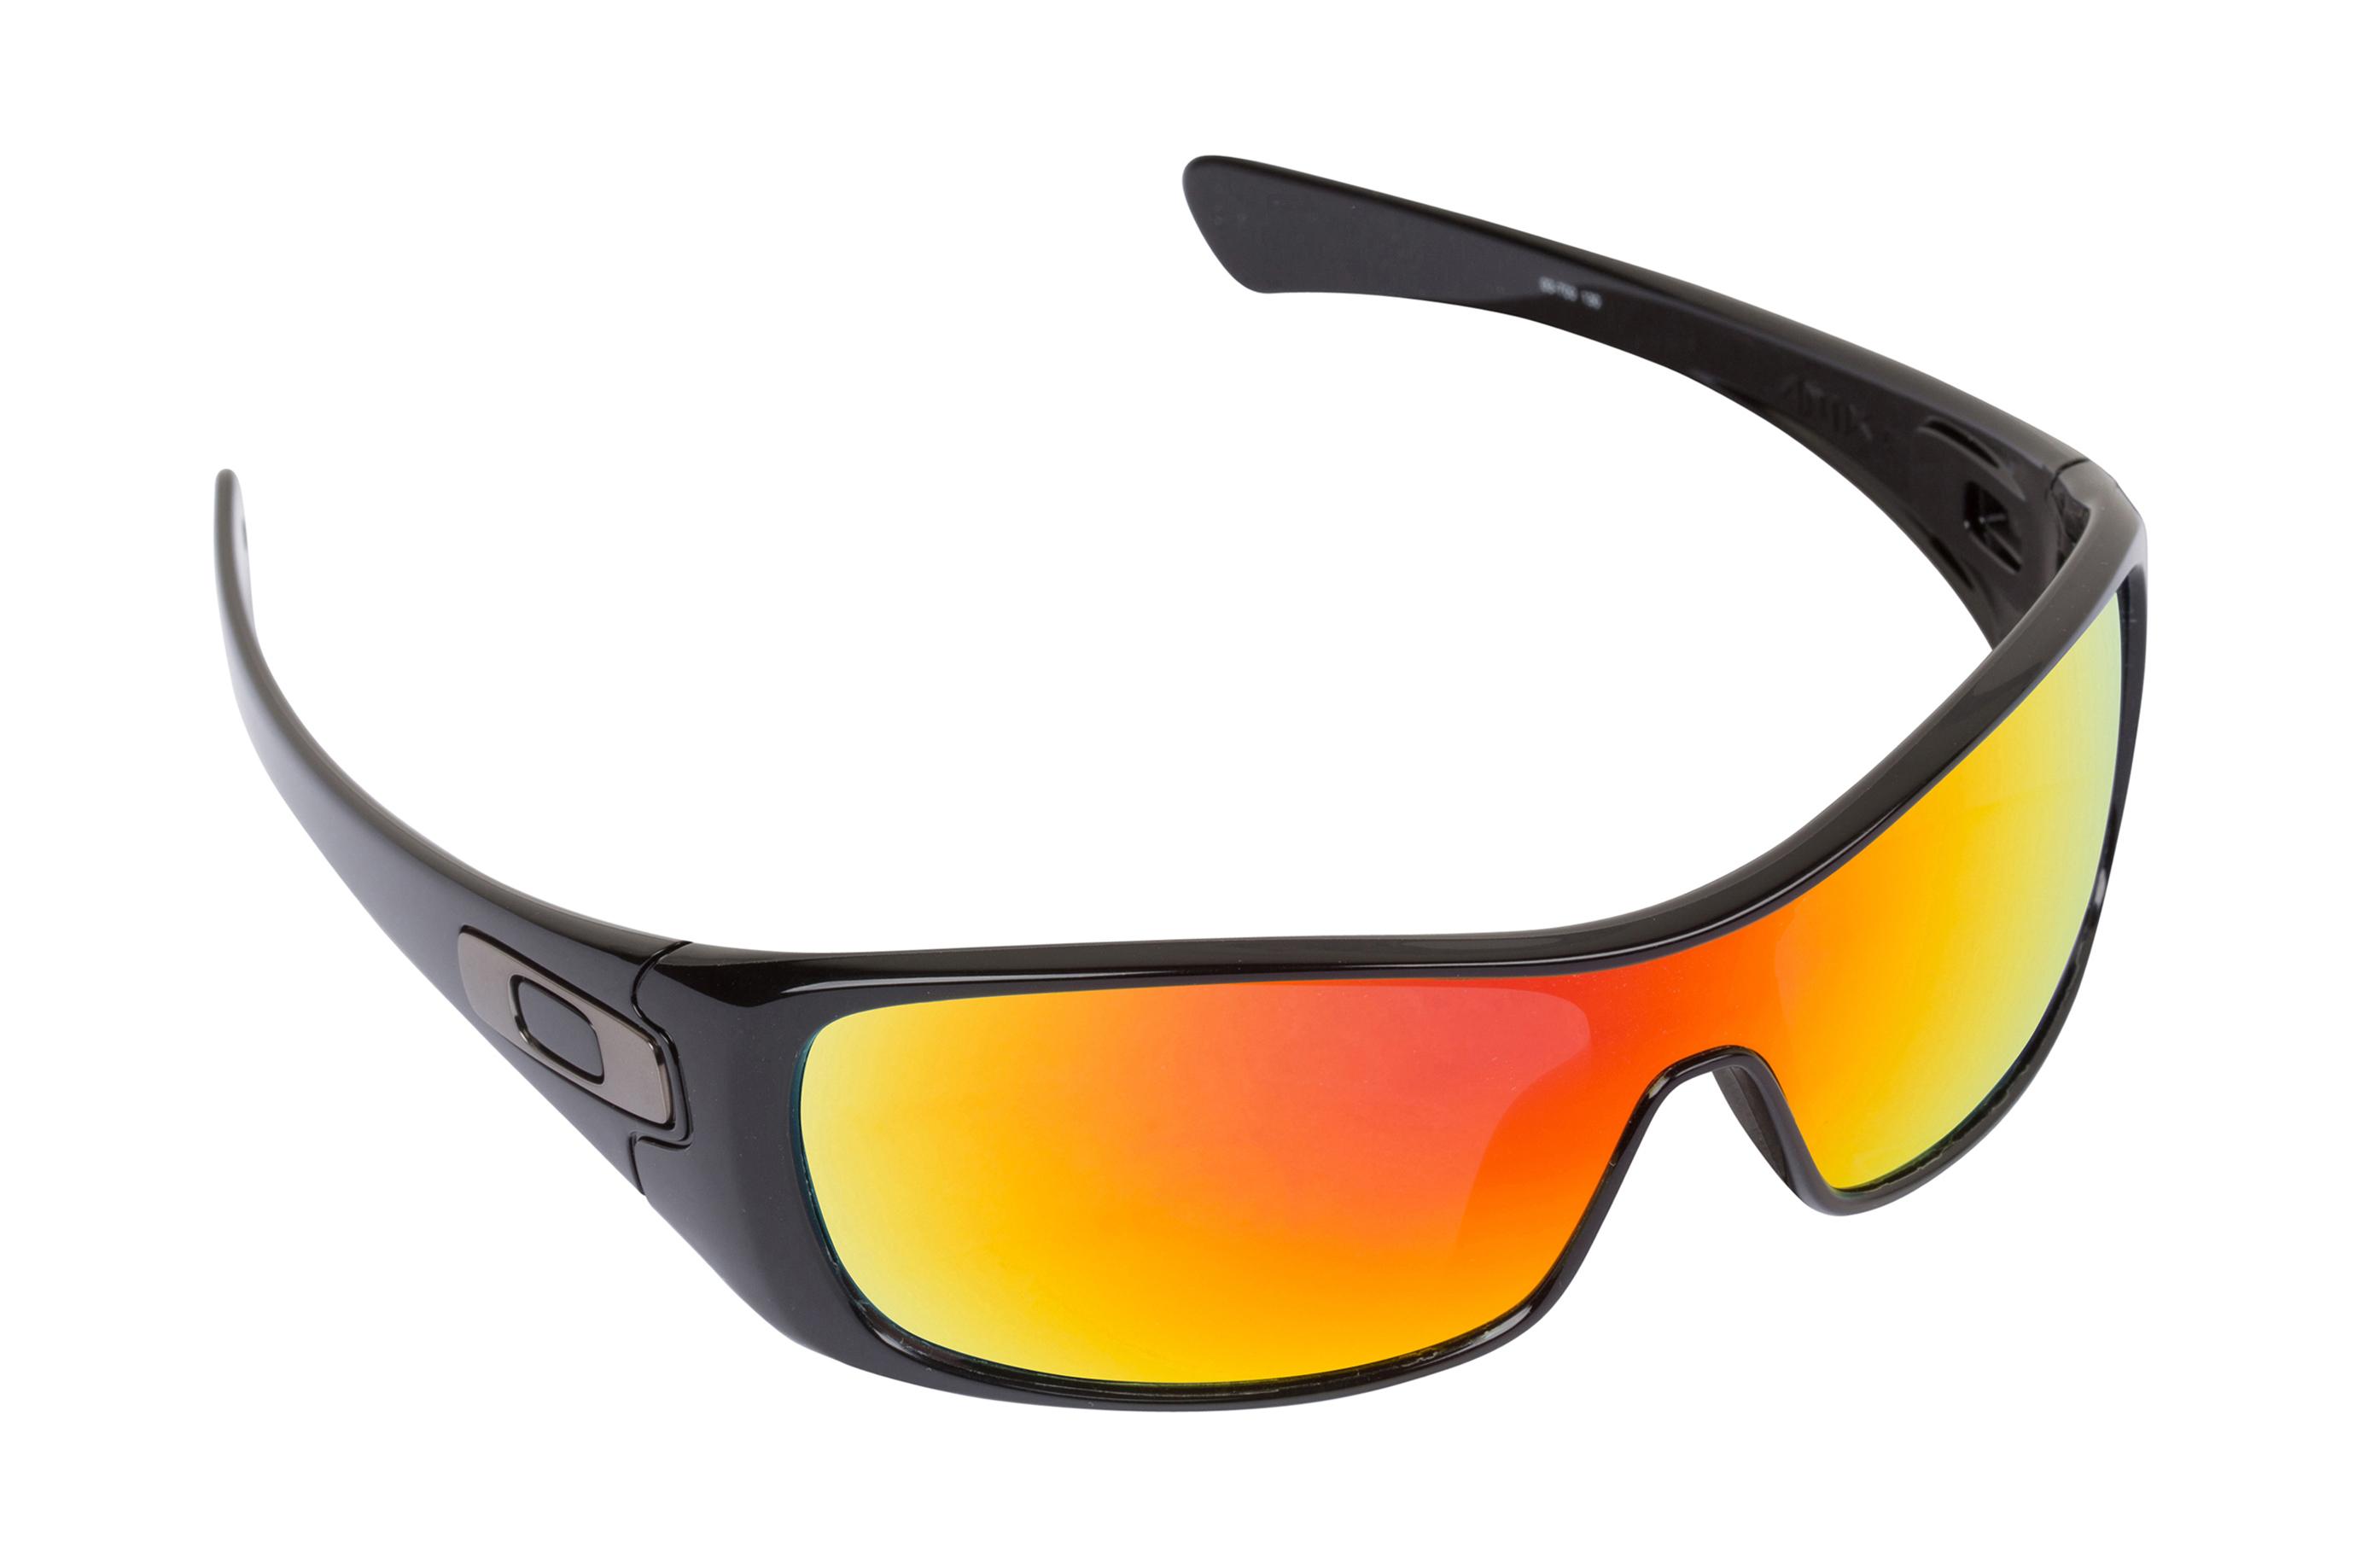 3913b671c9 Get Oakley Thump Pro Sunglasses « One More Soul